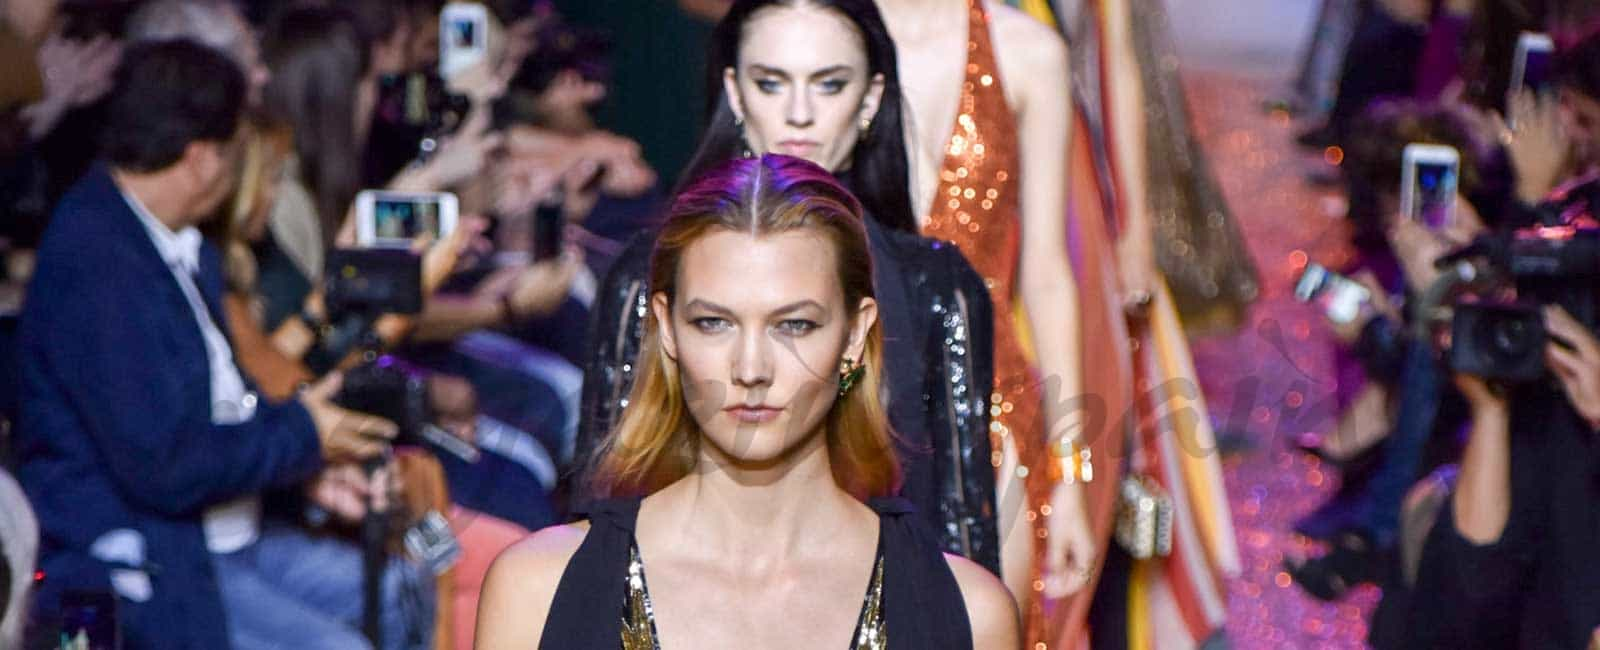 París Fashion Week: Elie Saab Primavera-Verano 2017